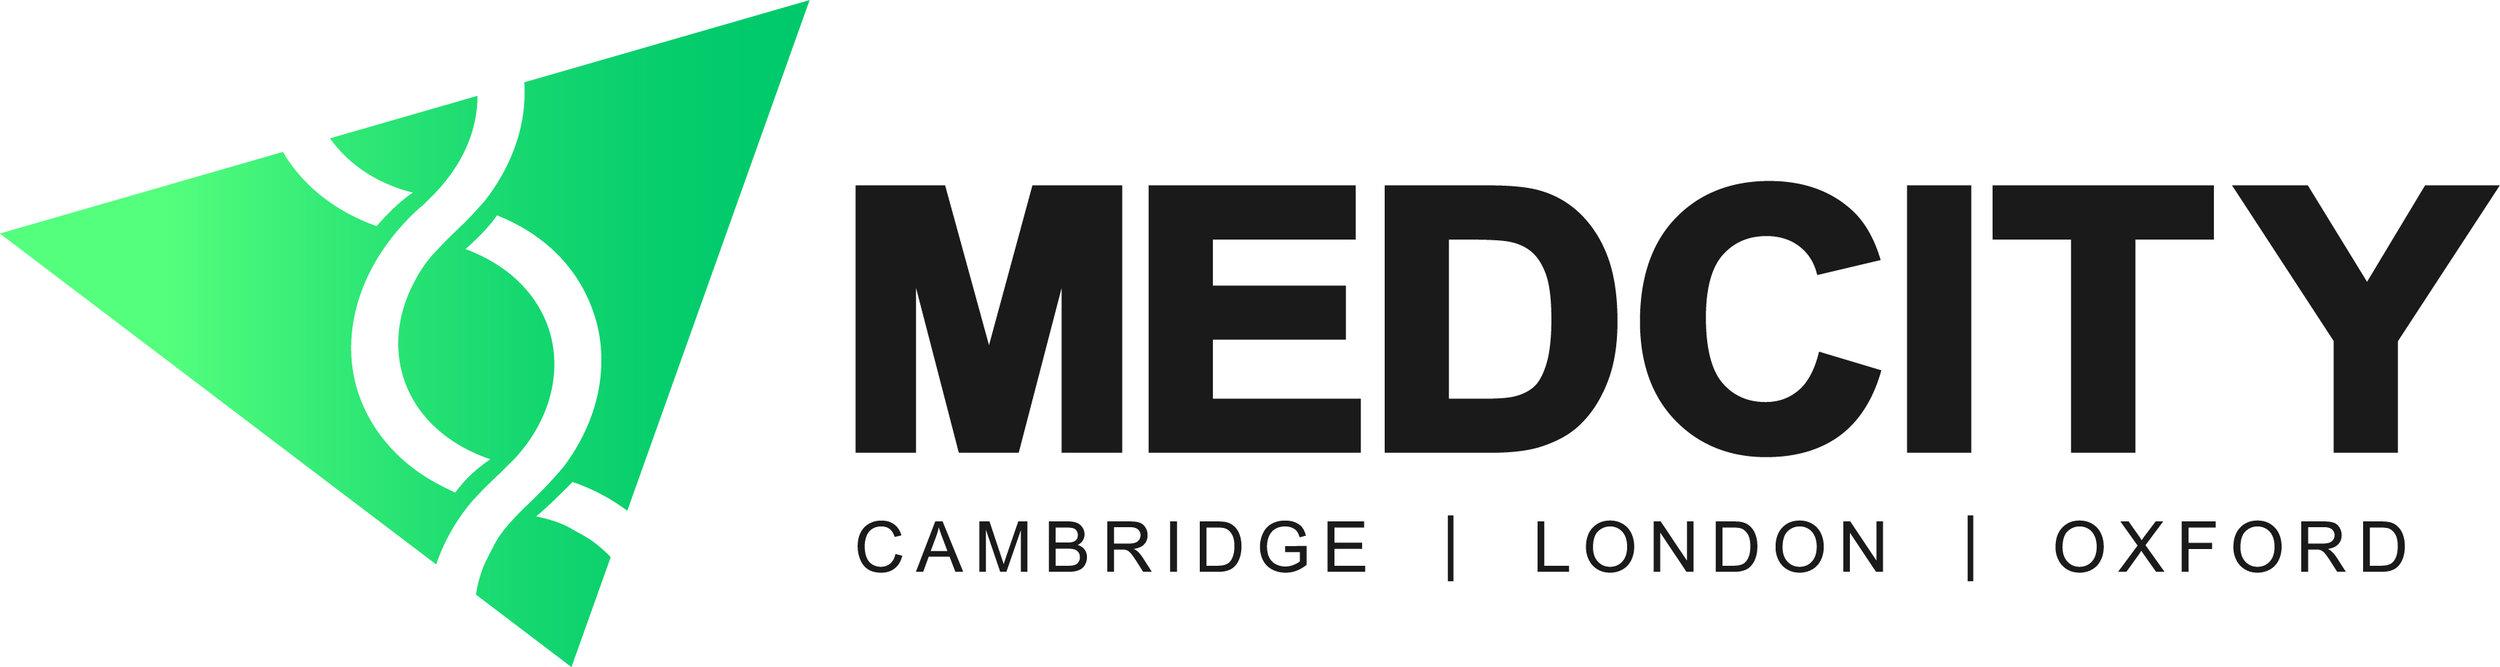 medcity-logo-01-cmyk.jpg